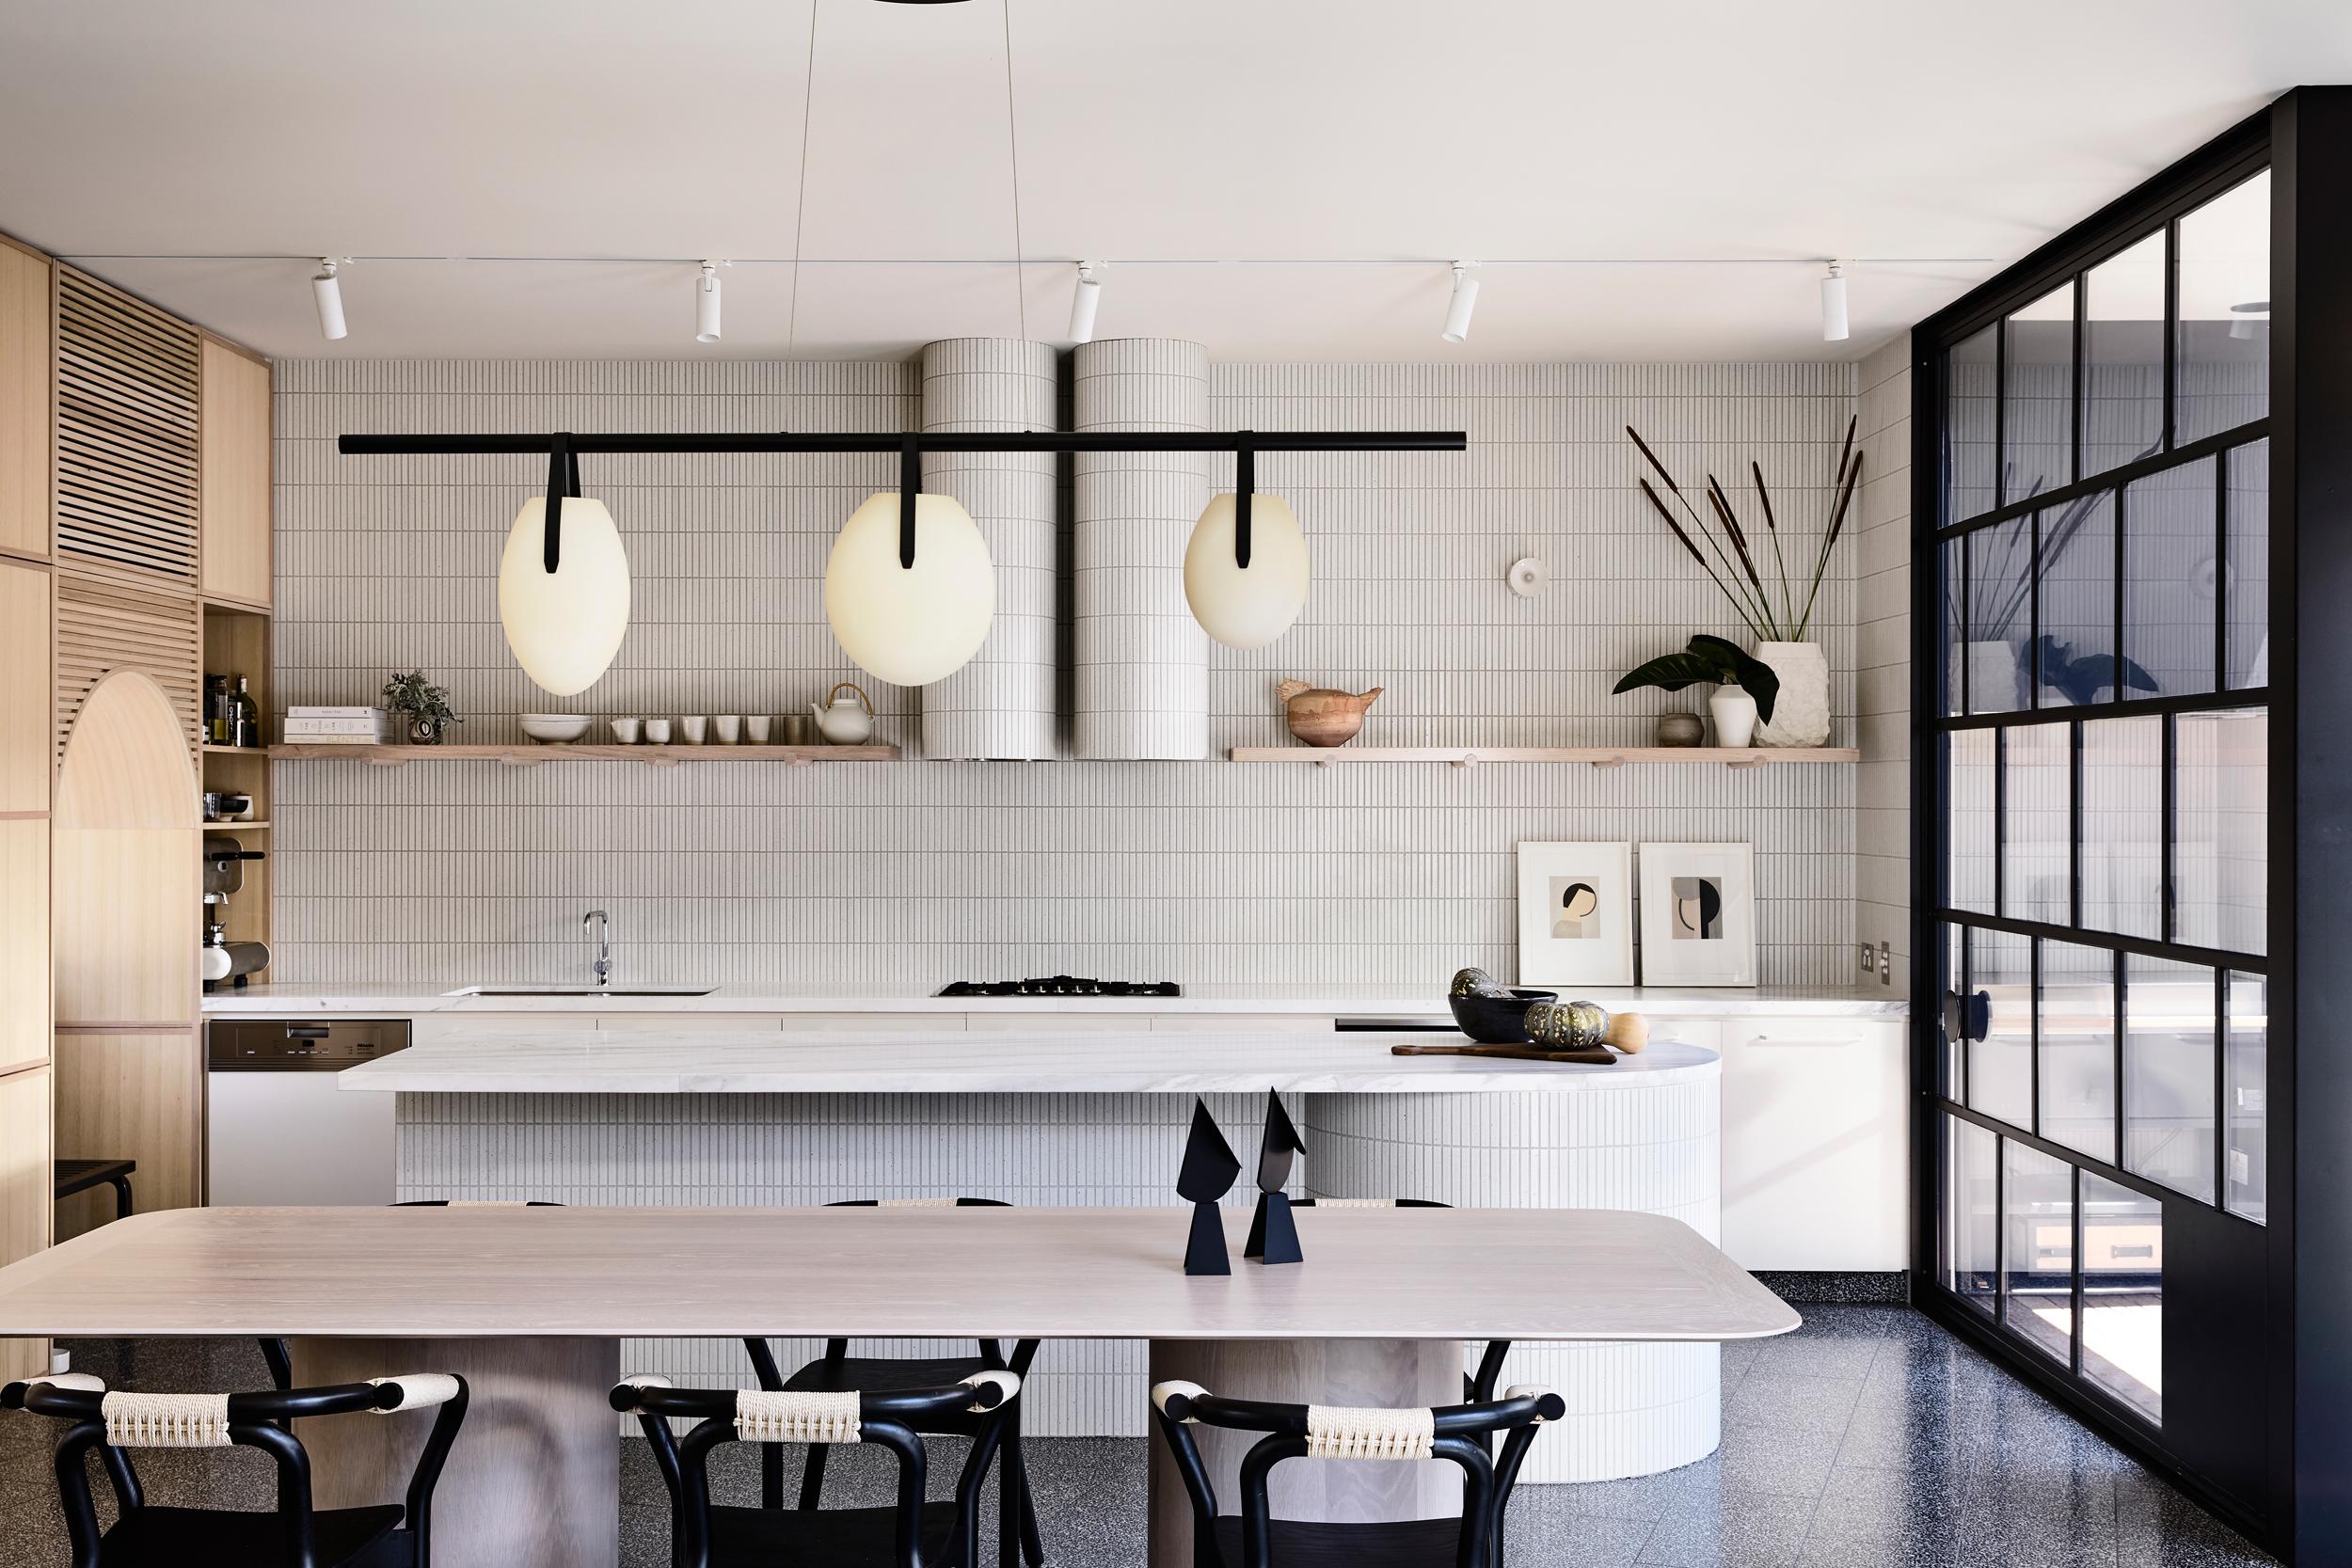 Dulux Colour Awards 2019 - Residential Interior. Caroline House by  Kennedy Nolan . Photo - Derek Swalwell.